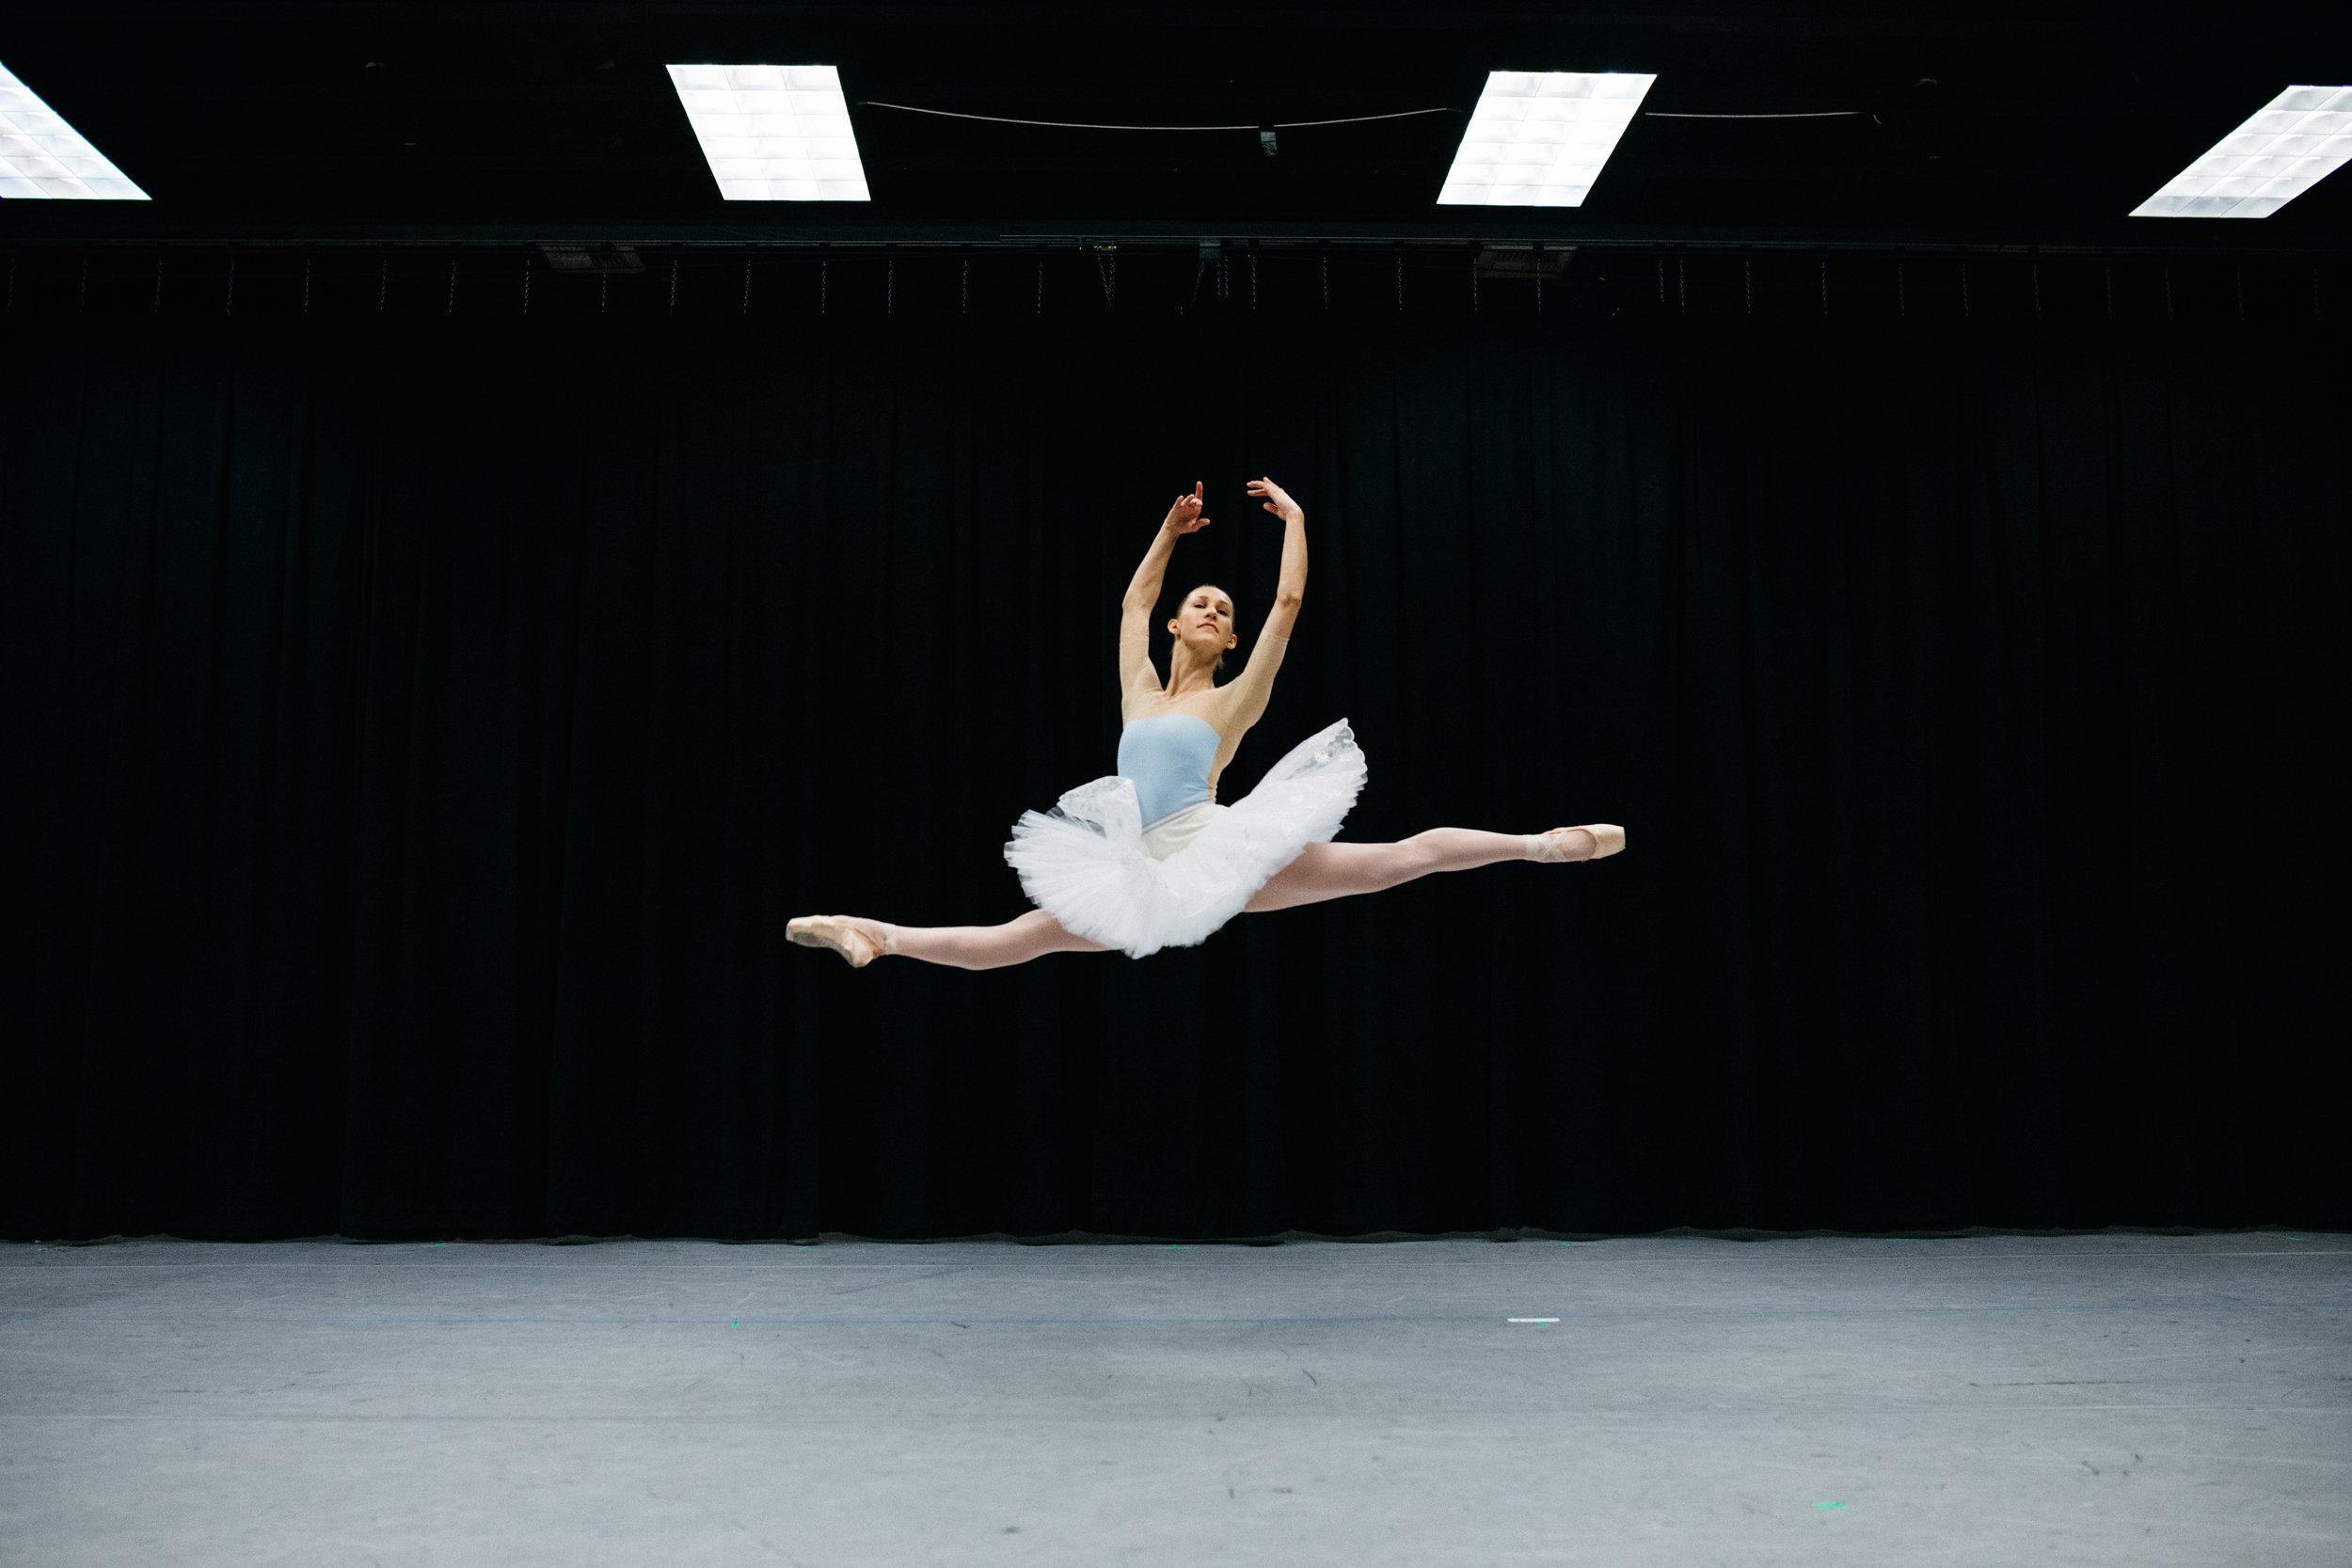 Jessica_Ballet-18.JPG